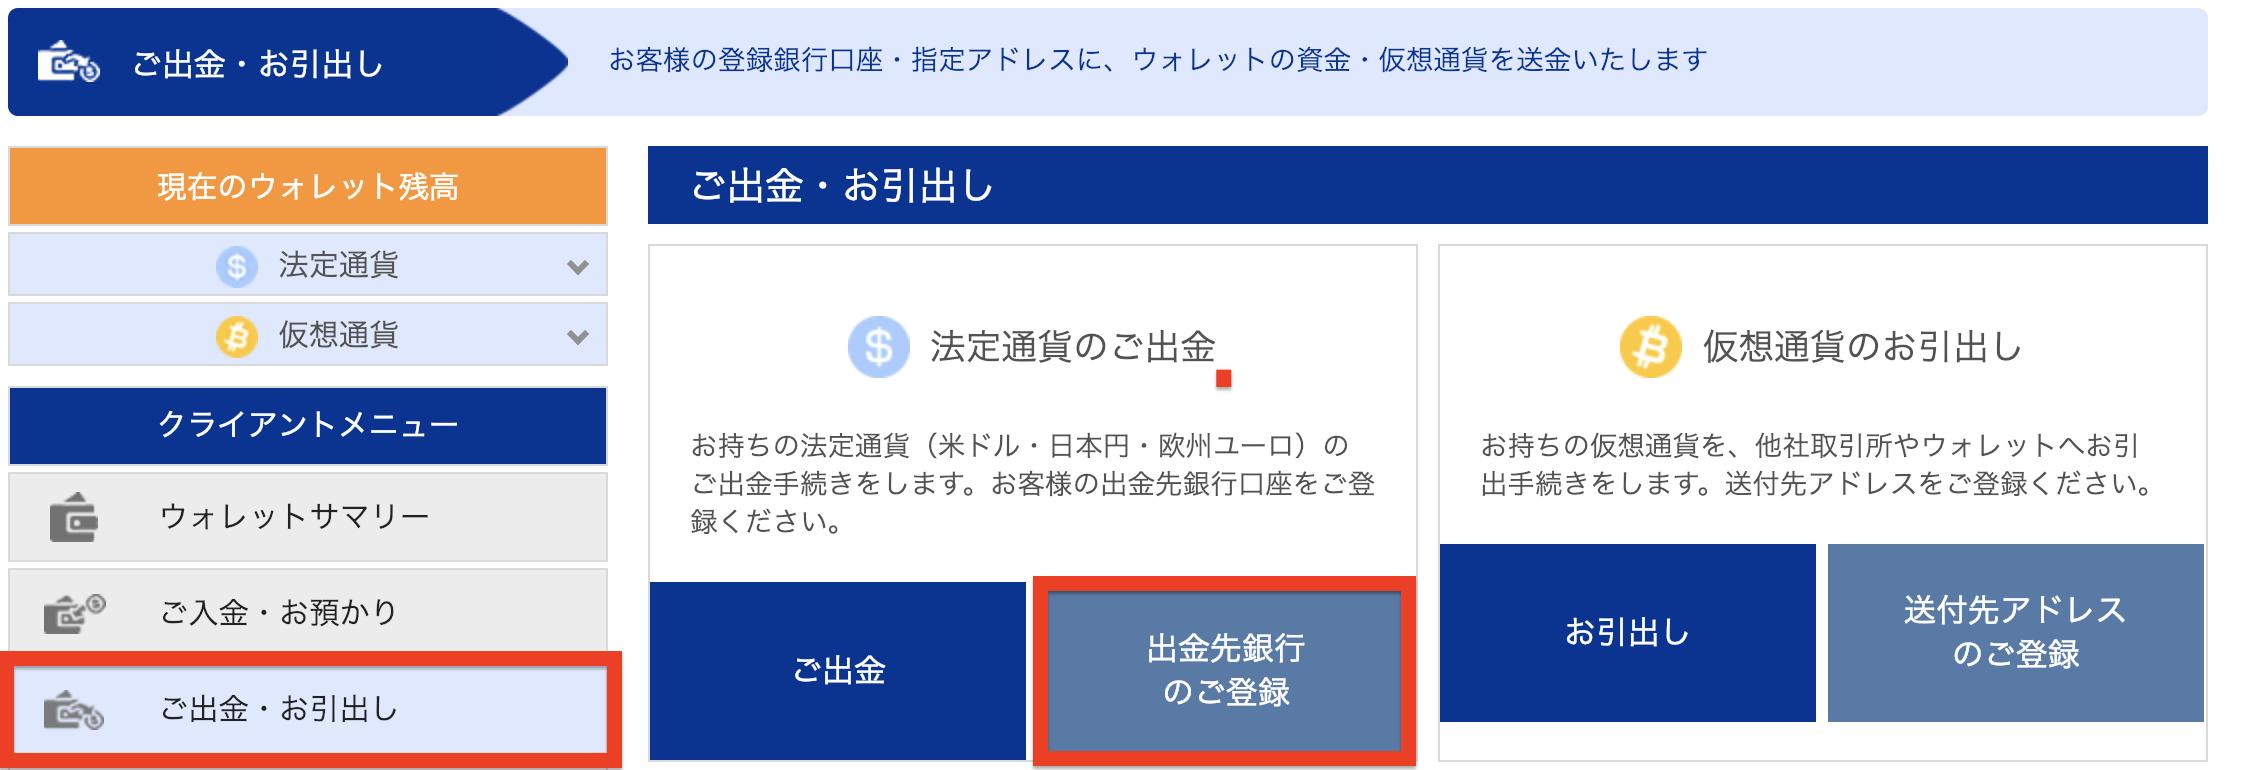 bitwallet出金申請画面